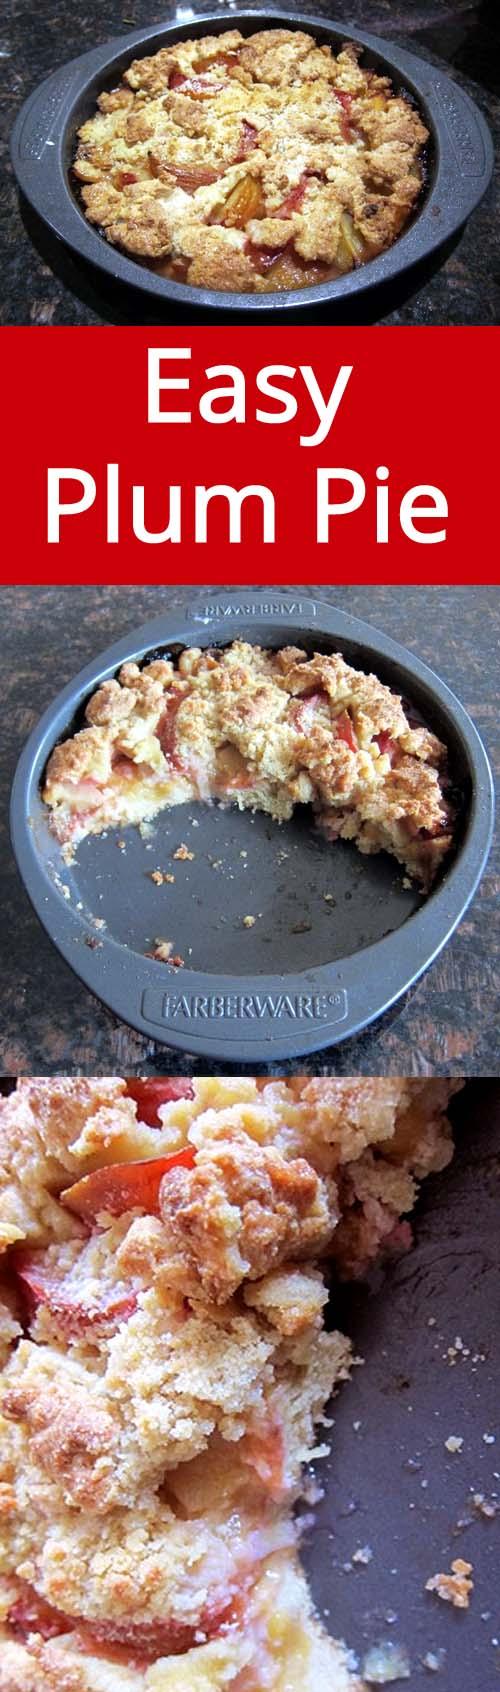 Plum Pie Recipe with fresh plums - so easy, anyone can make this!   MelanieCooks.com